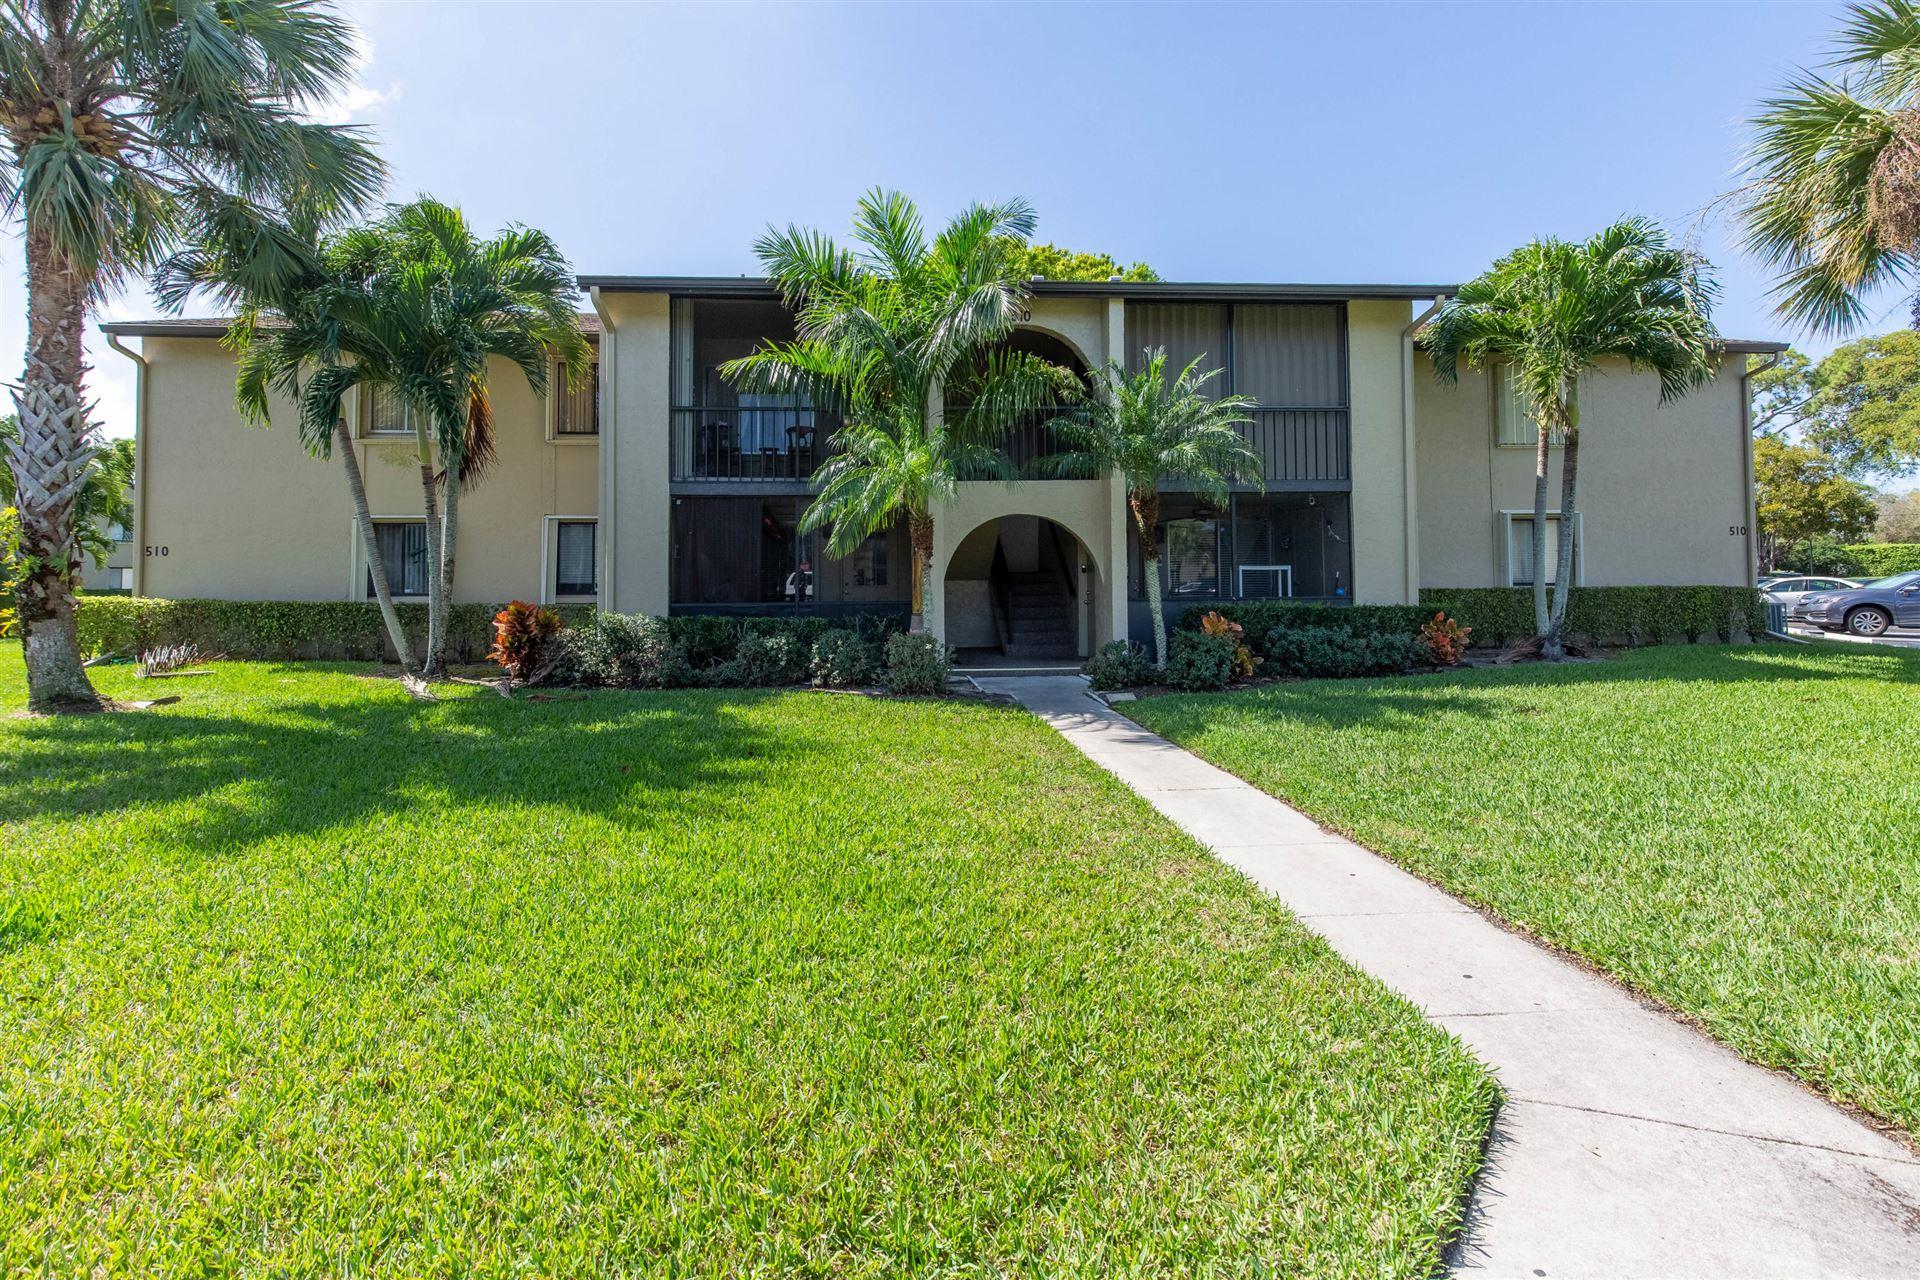 510 Shady Pine Way #A1, Greenacres, FL 33415 - MLS#: RX-10695954